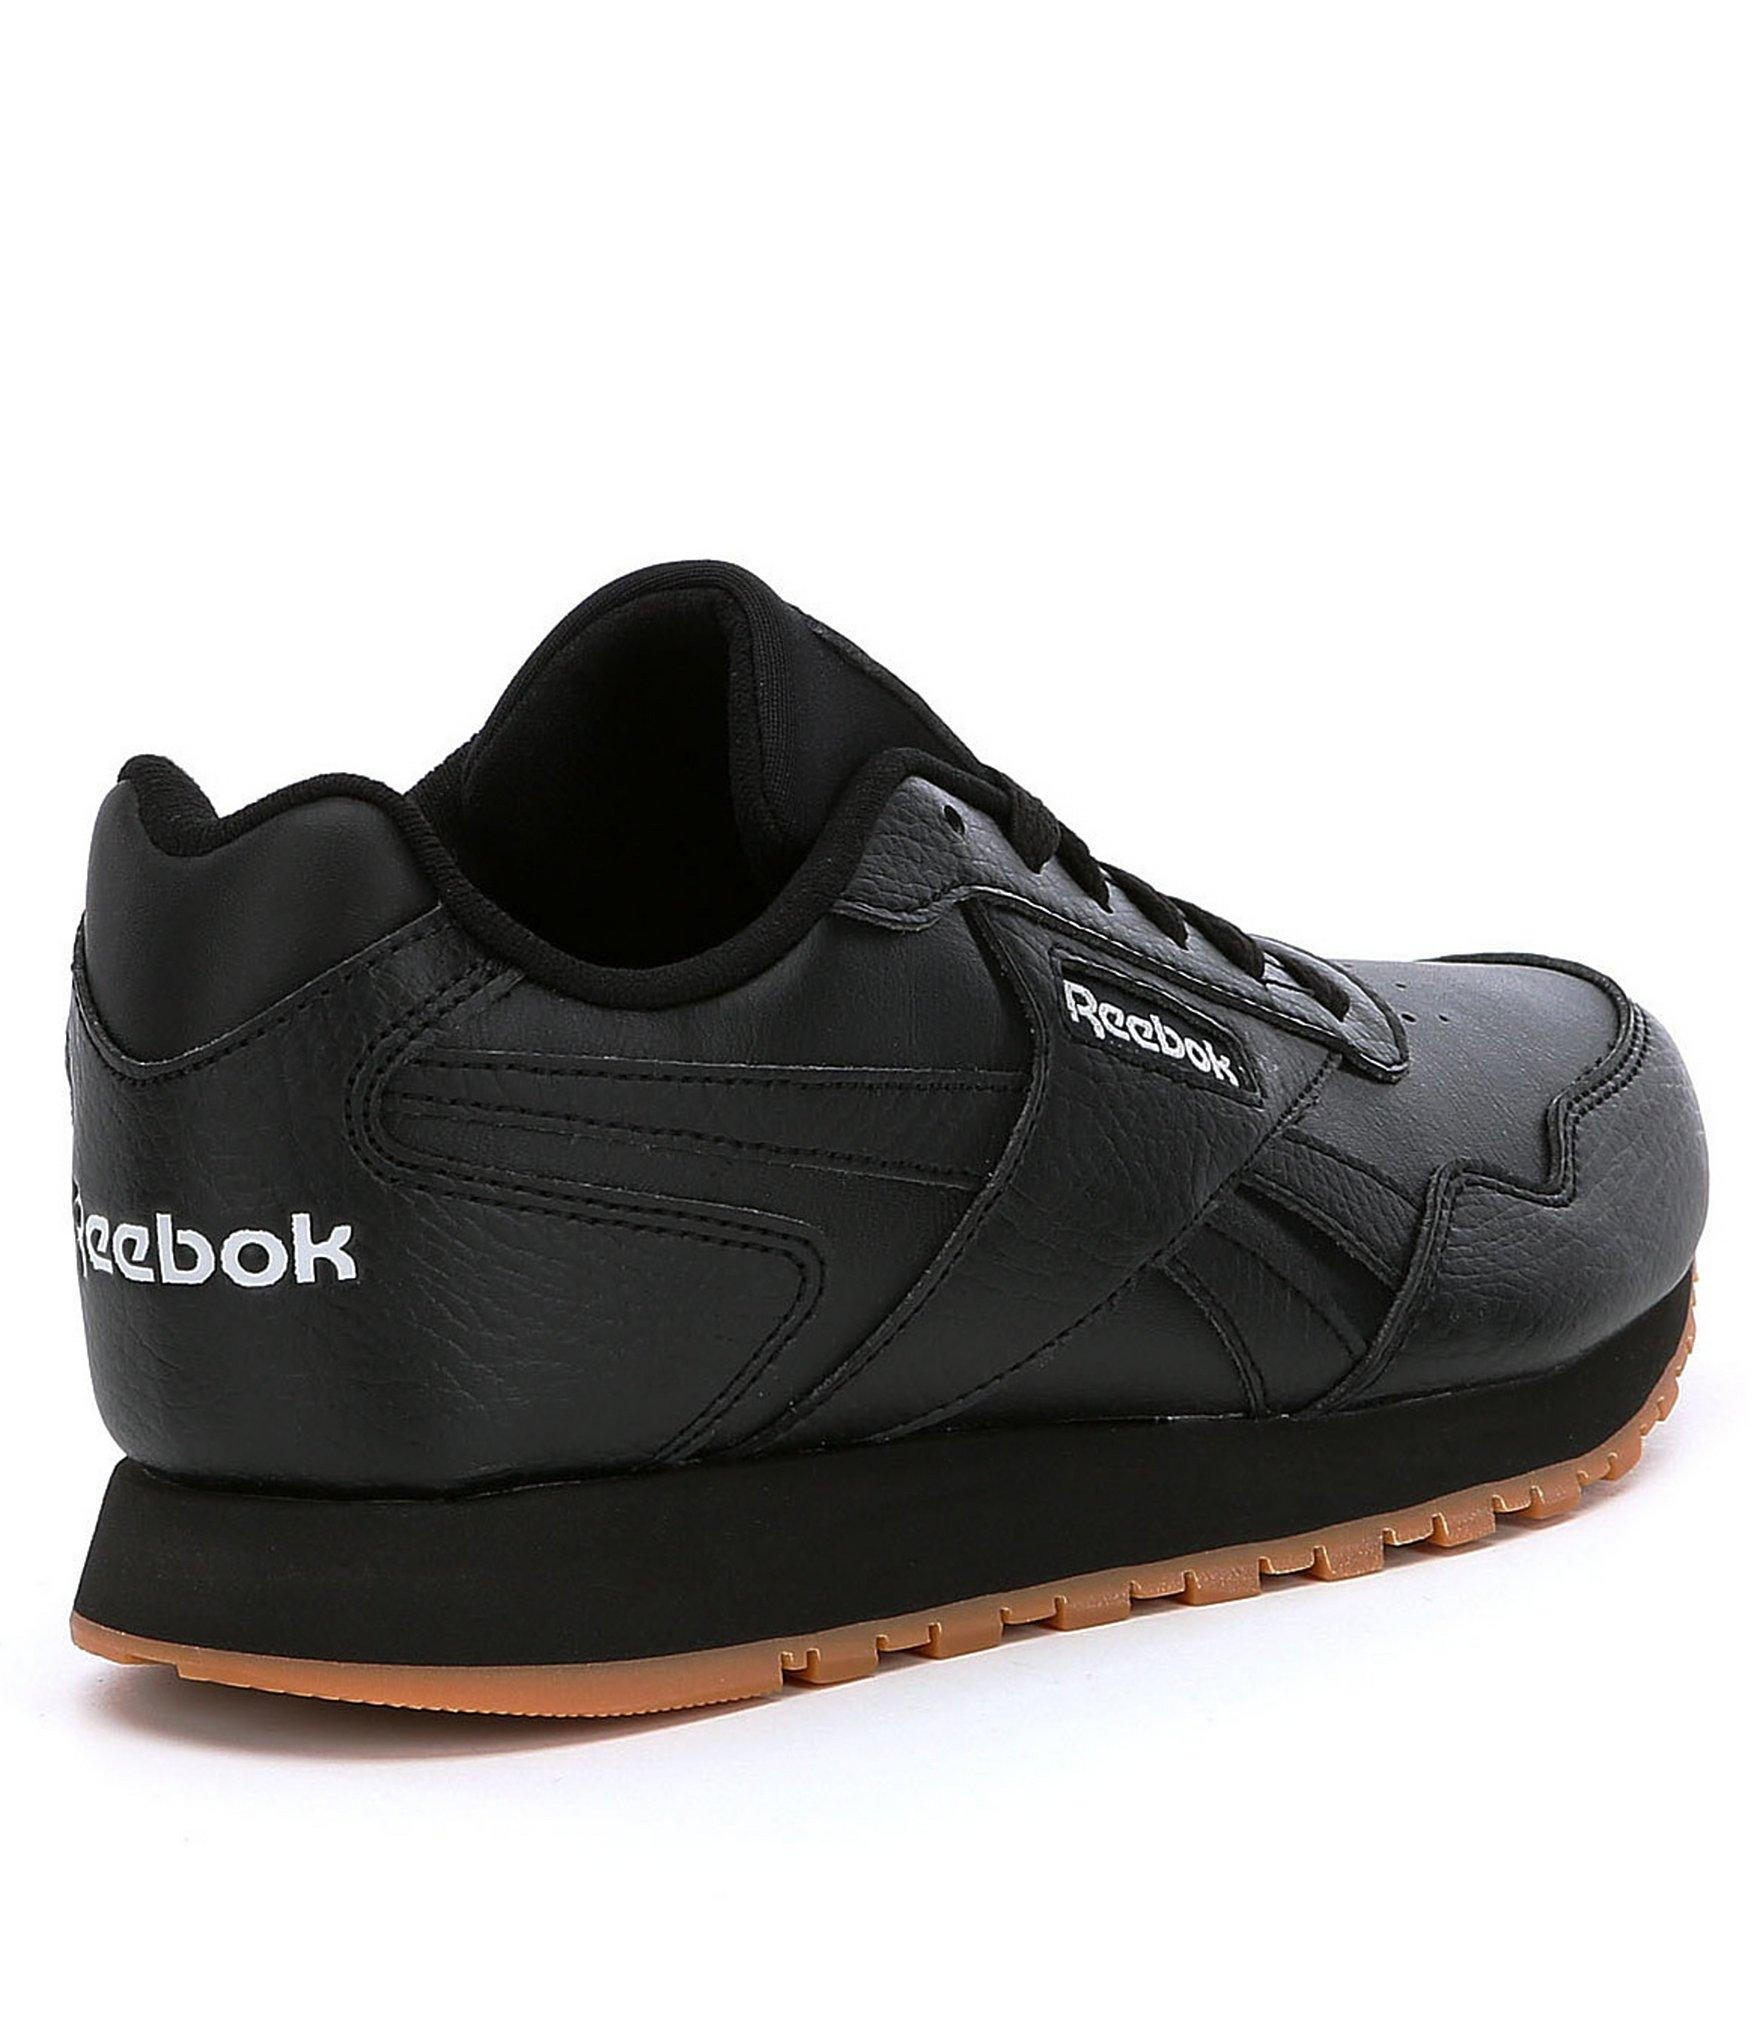 f50a8c2f81323 Reebok - Black Women s Classic Harman Run Shoes - Lyst. View fullscreen